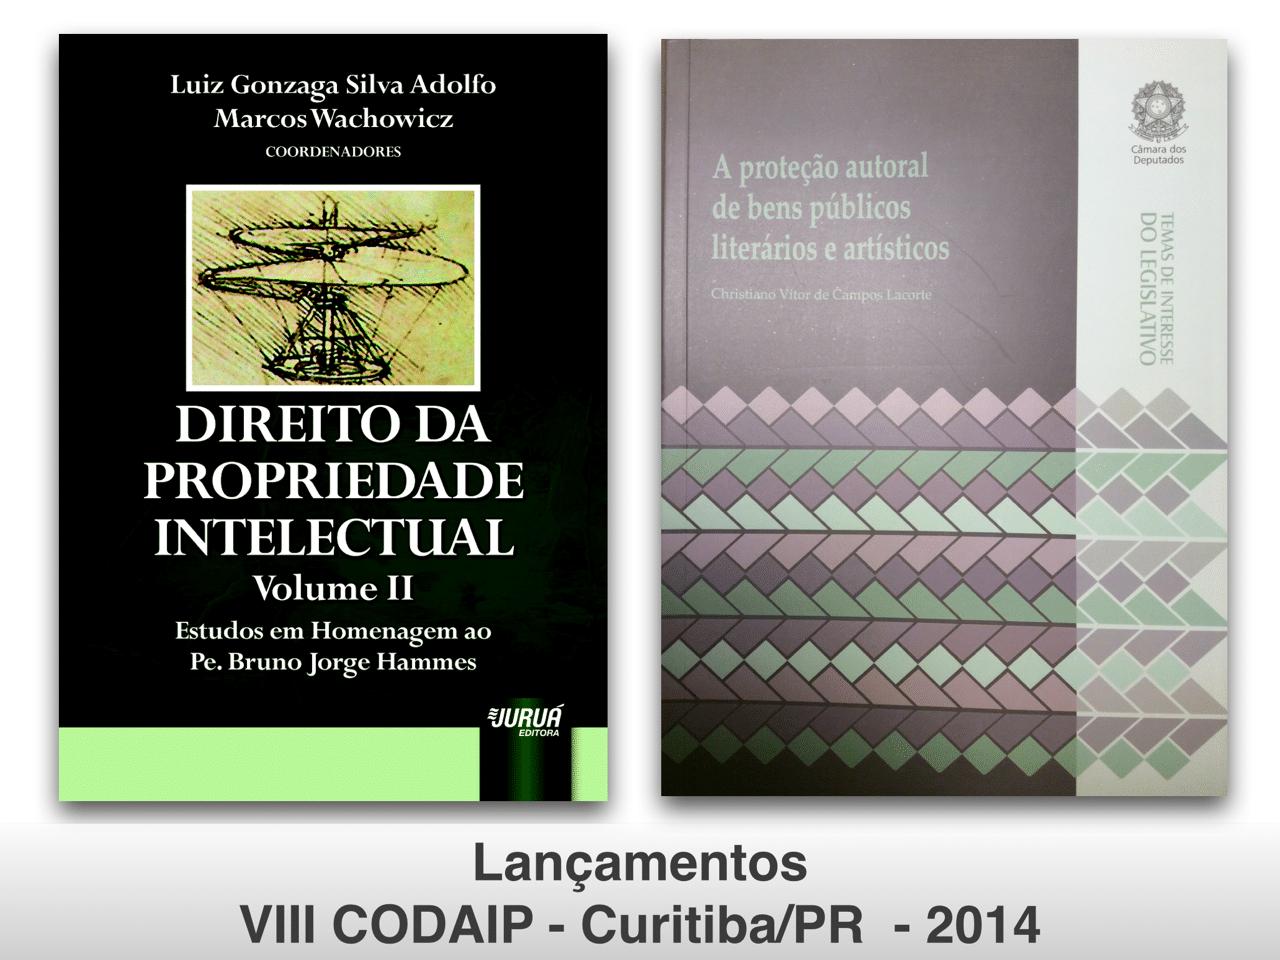 Read more about the article Lançamentos de livros na área de Propriedade Intelectual no VIII CODAIP